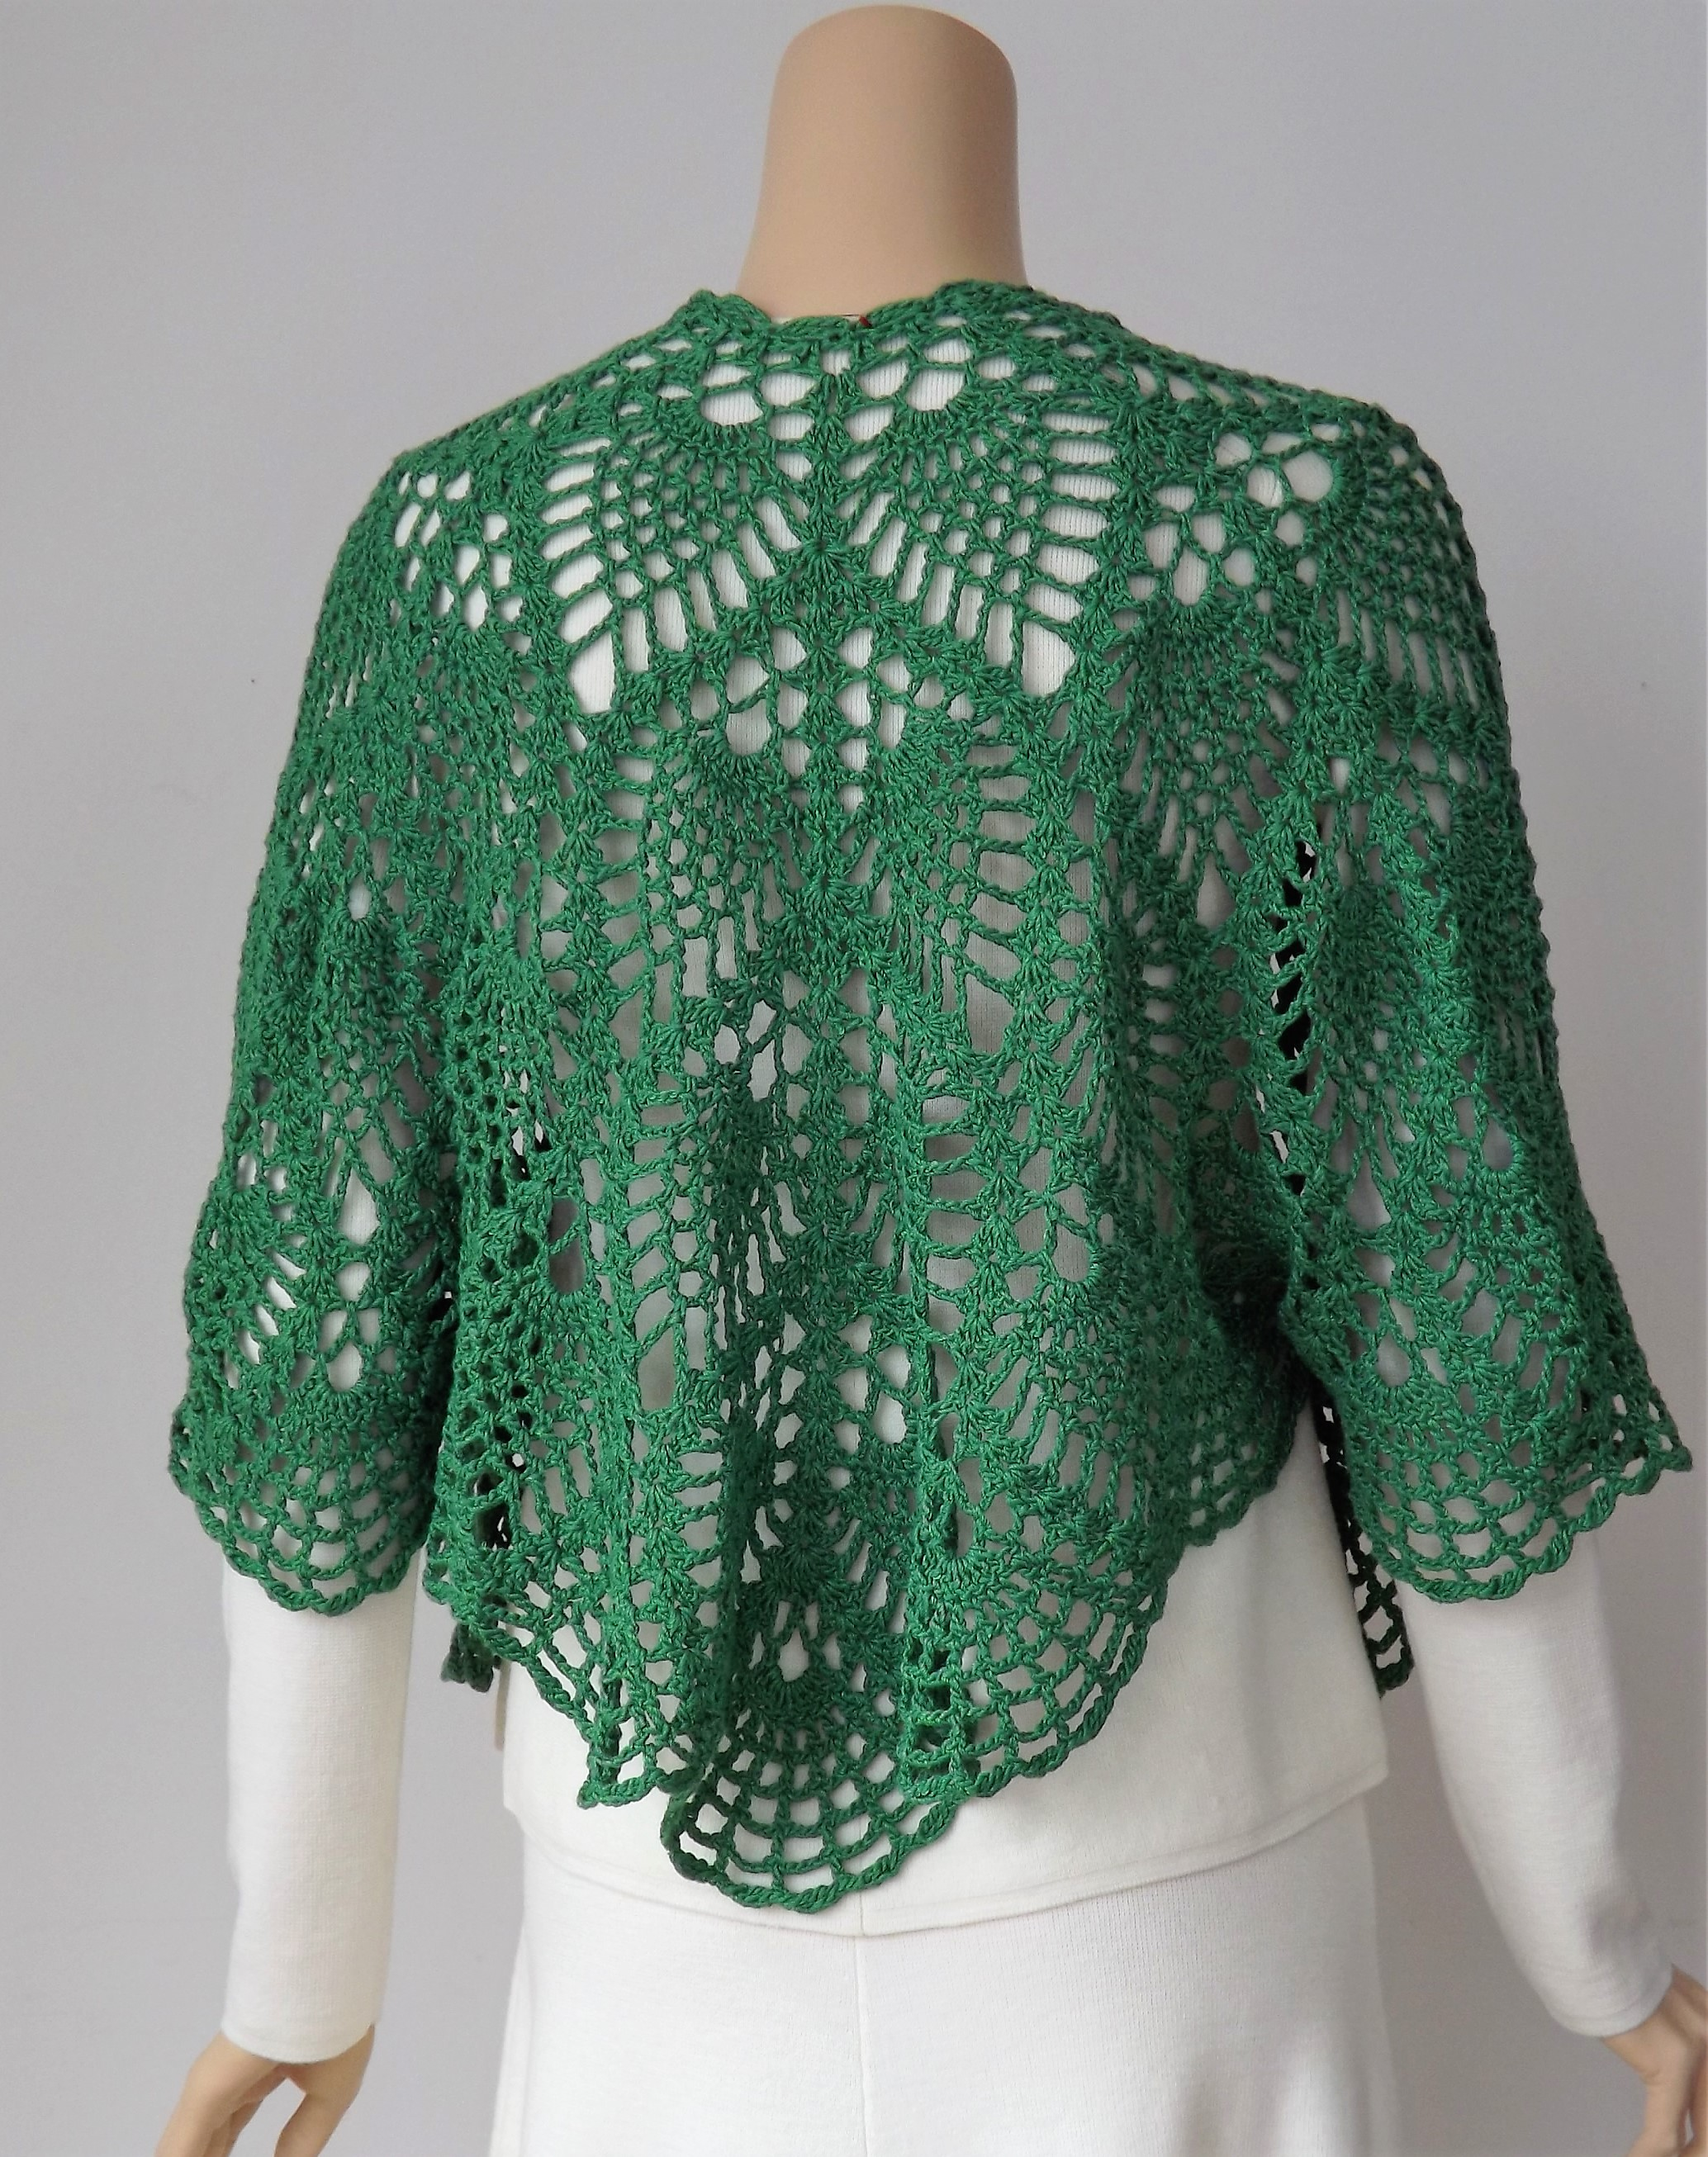 Doris Chan Crochet Musings From Designer All Shawl Stitch Diagrams Lotus Curacao Jacket